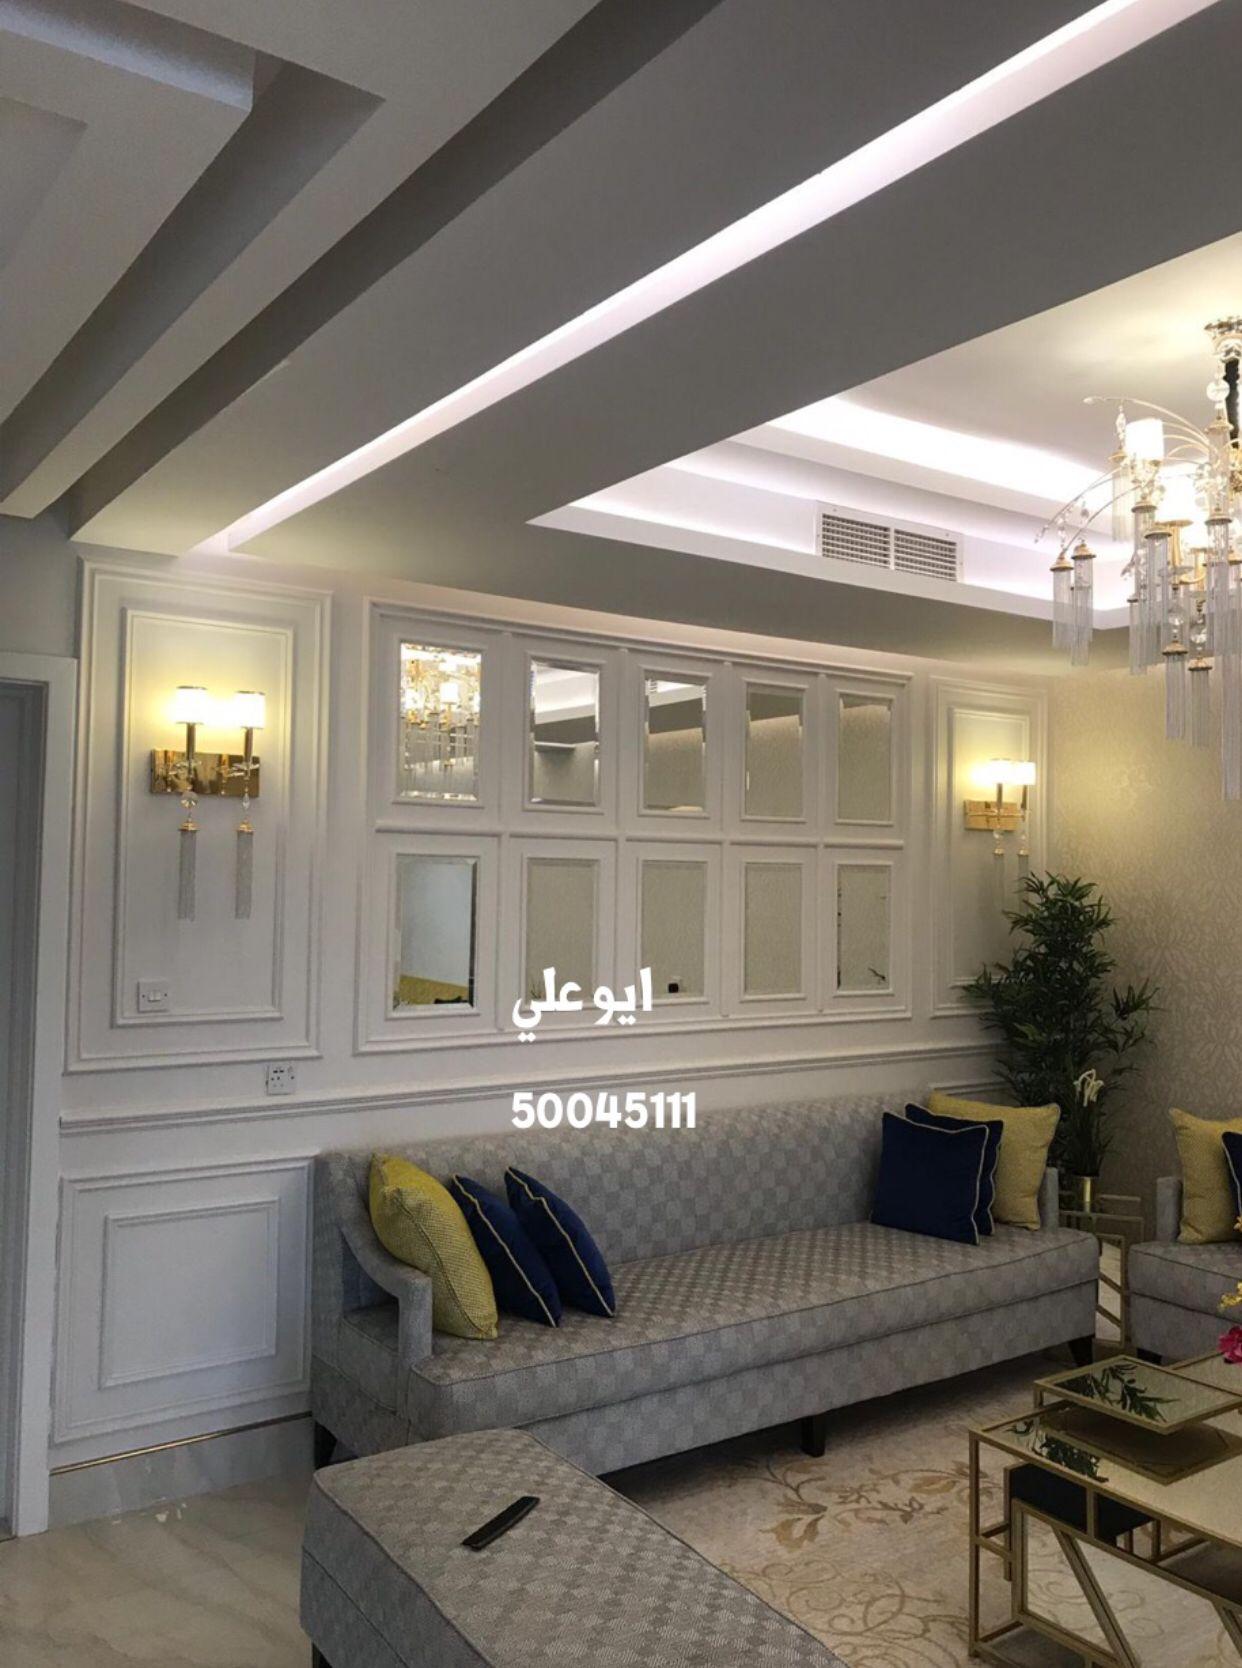 ابو علي 50045111 | Home decor, Home, Decor on Hhh Outdoor Living id=52857